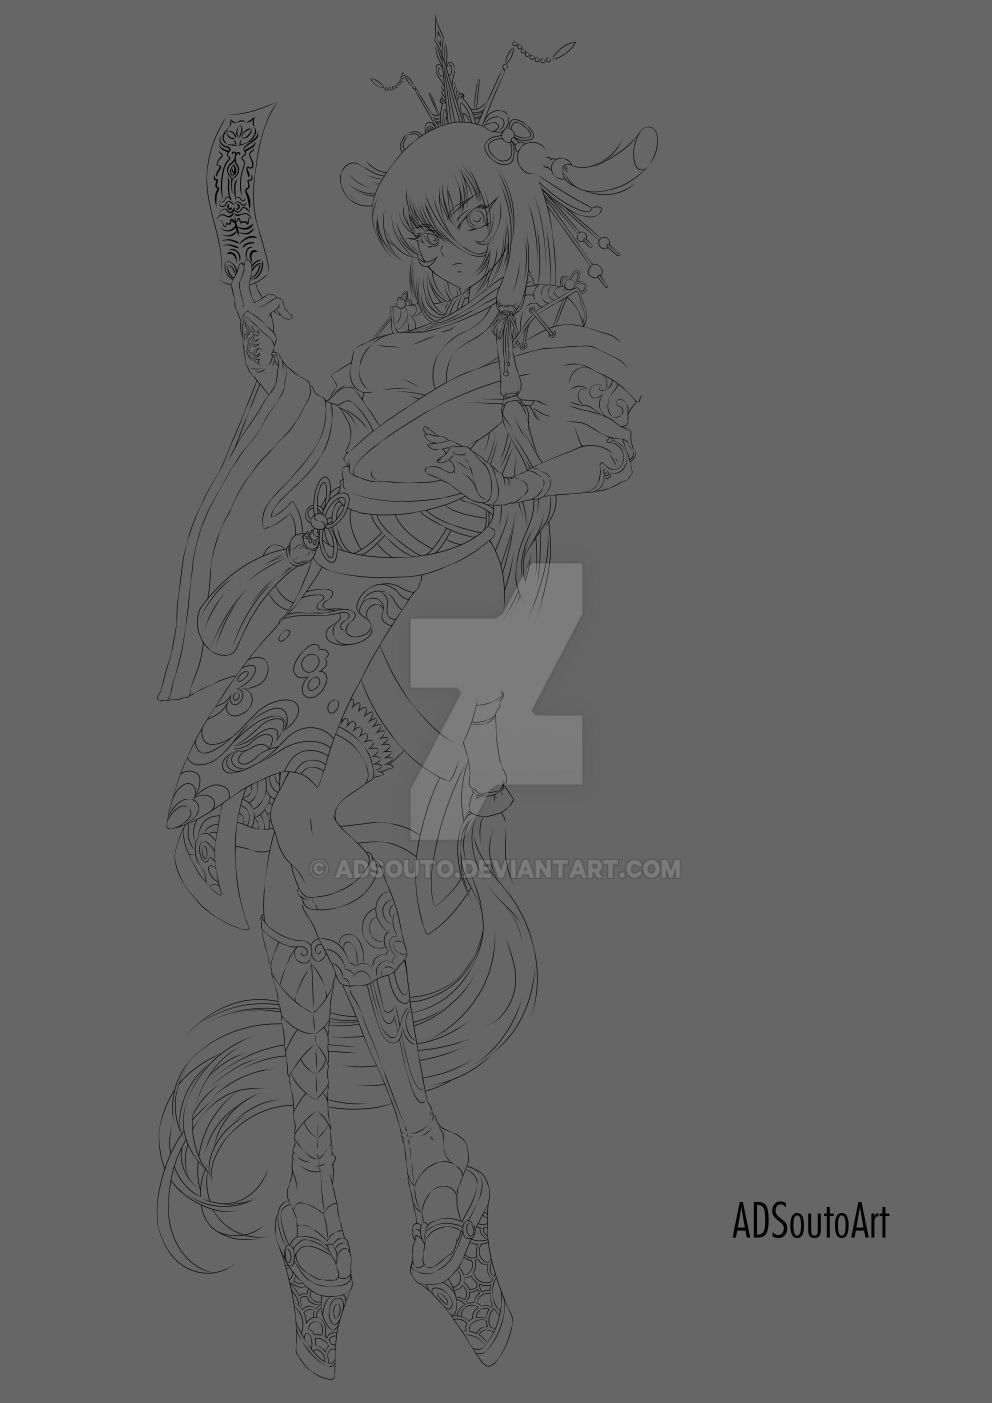 Haruna lineart by ADSouto